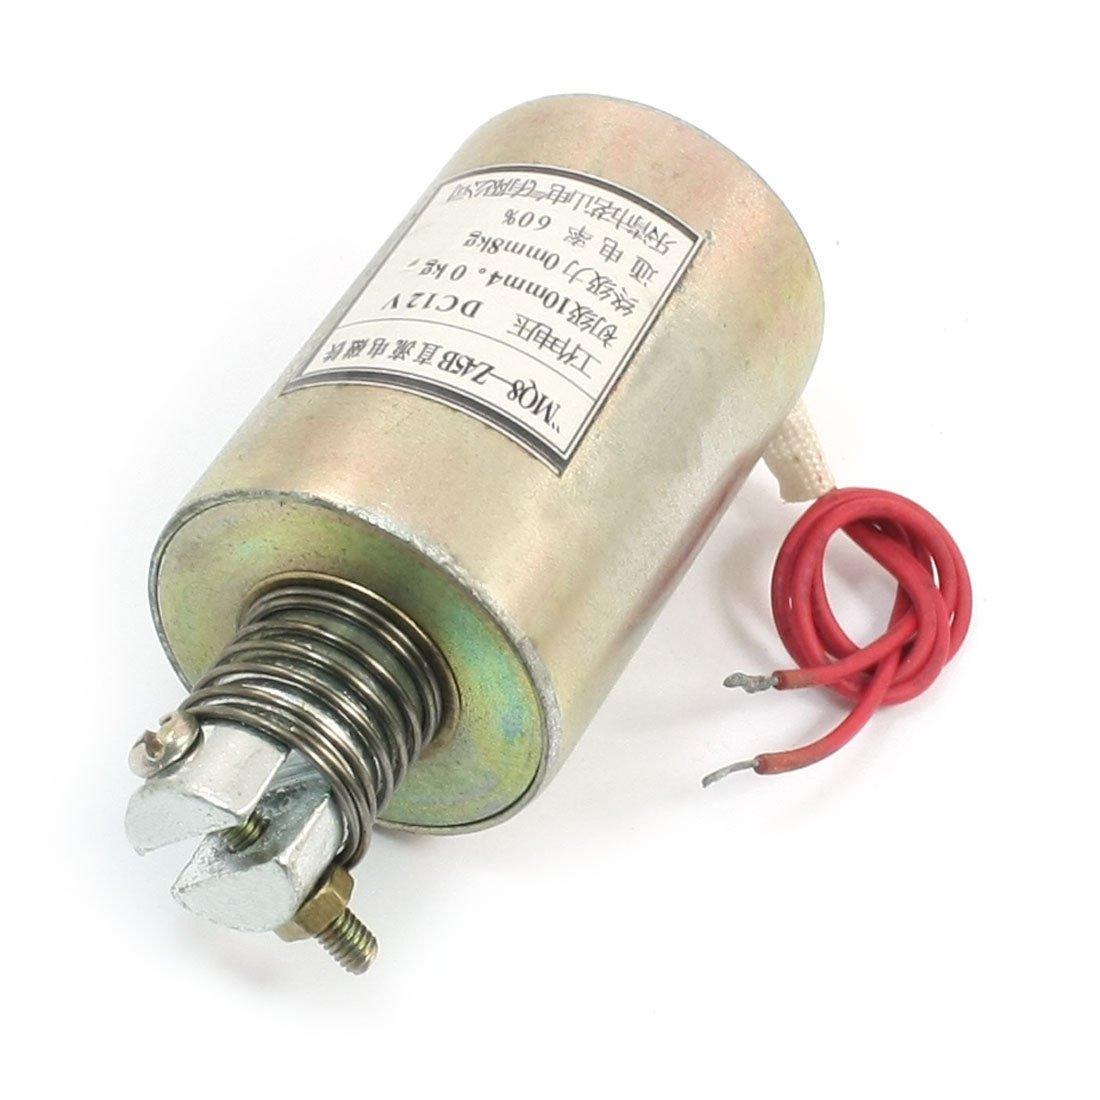 DC 12V 10mm/4Kg 0mm/8Kg Push Pull Tubular Solenoid Electromagnet MQ8-Z45B